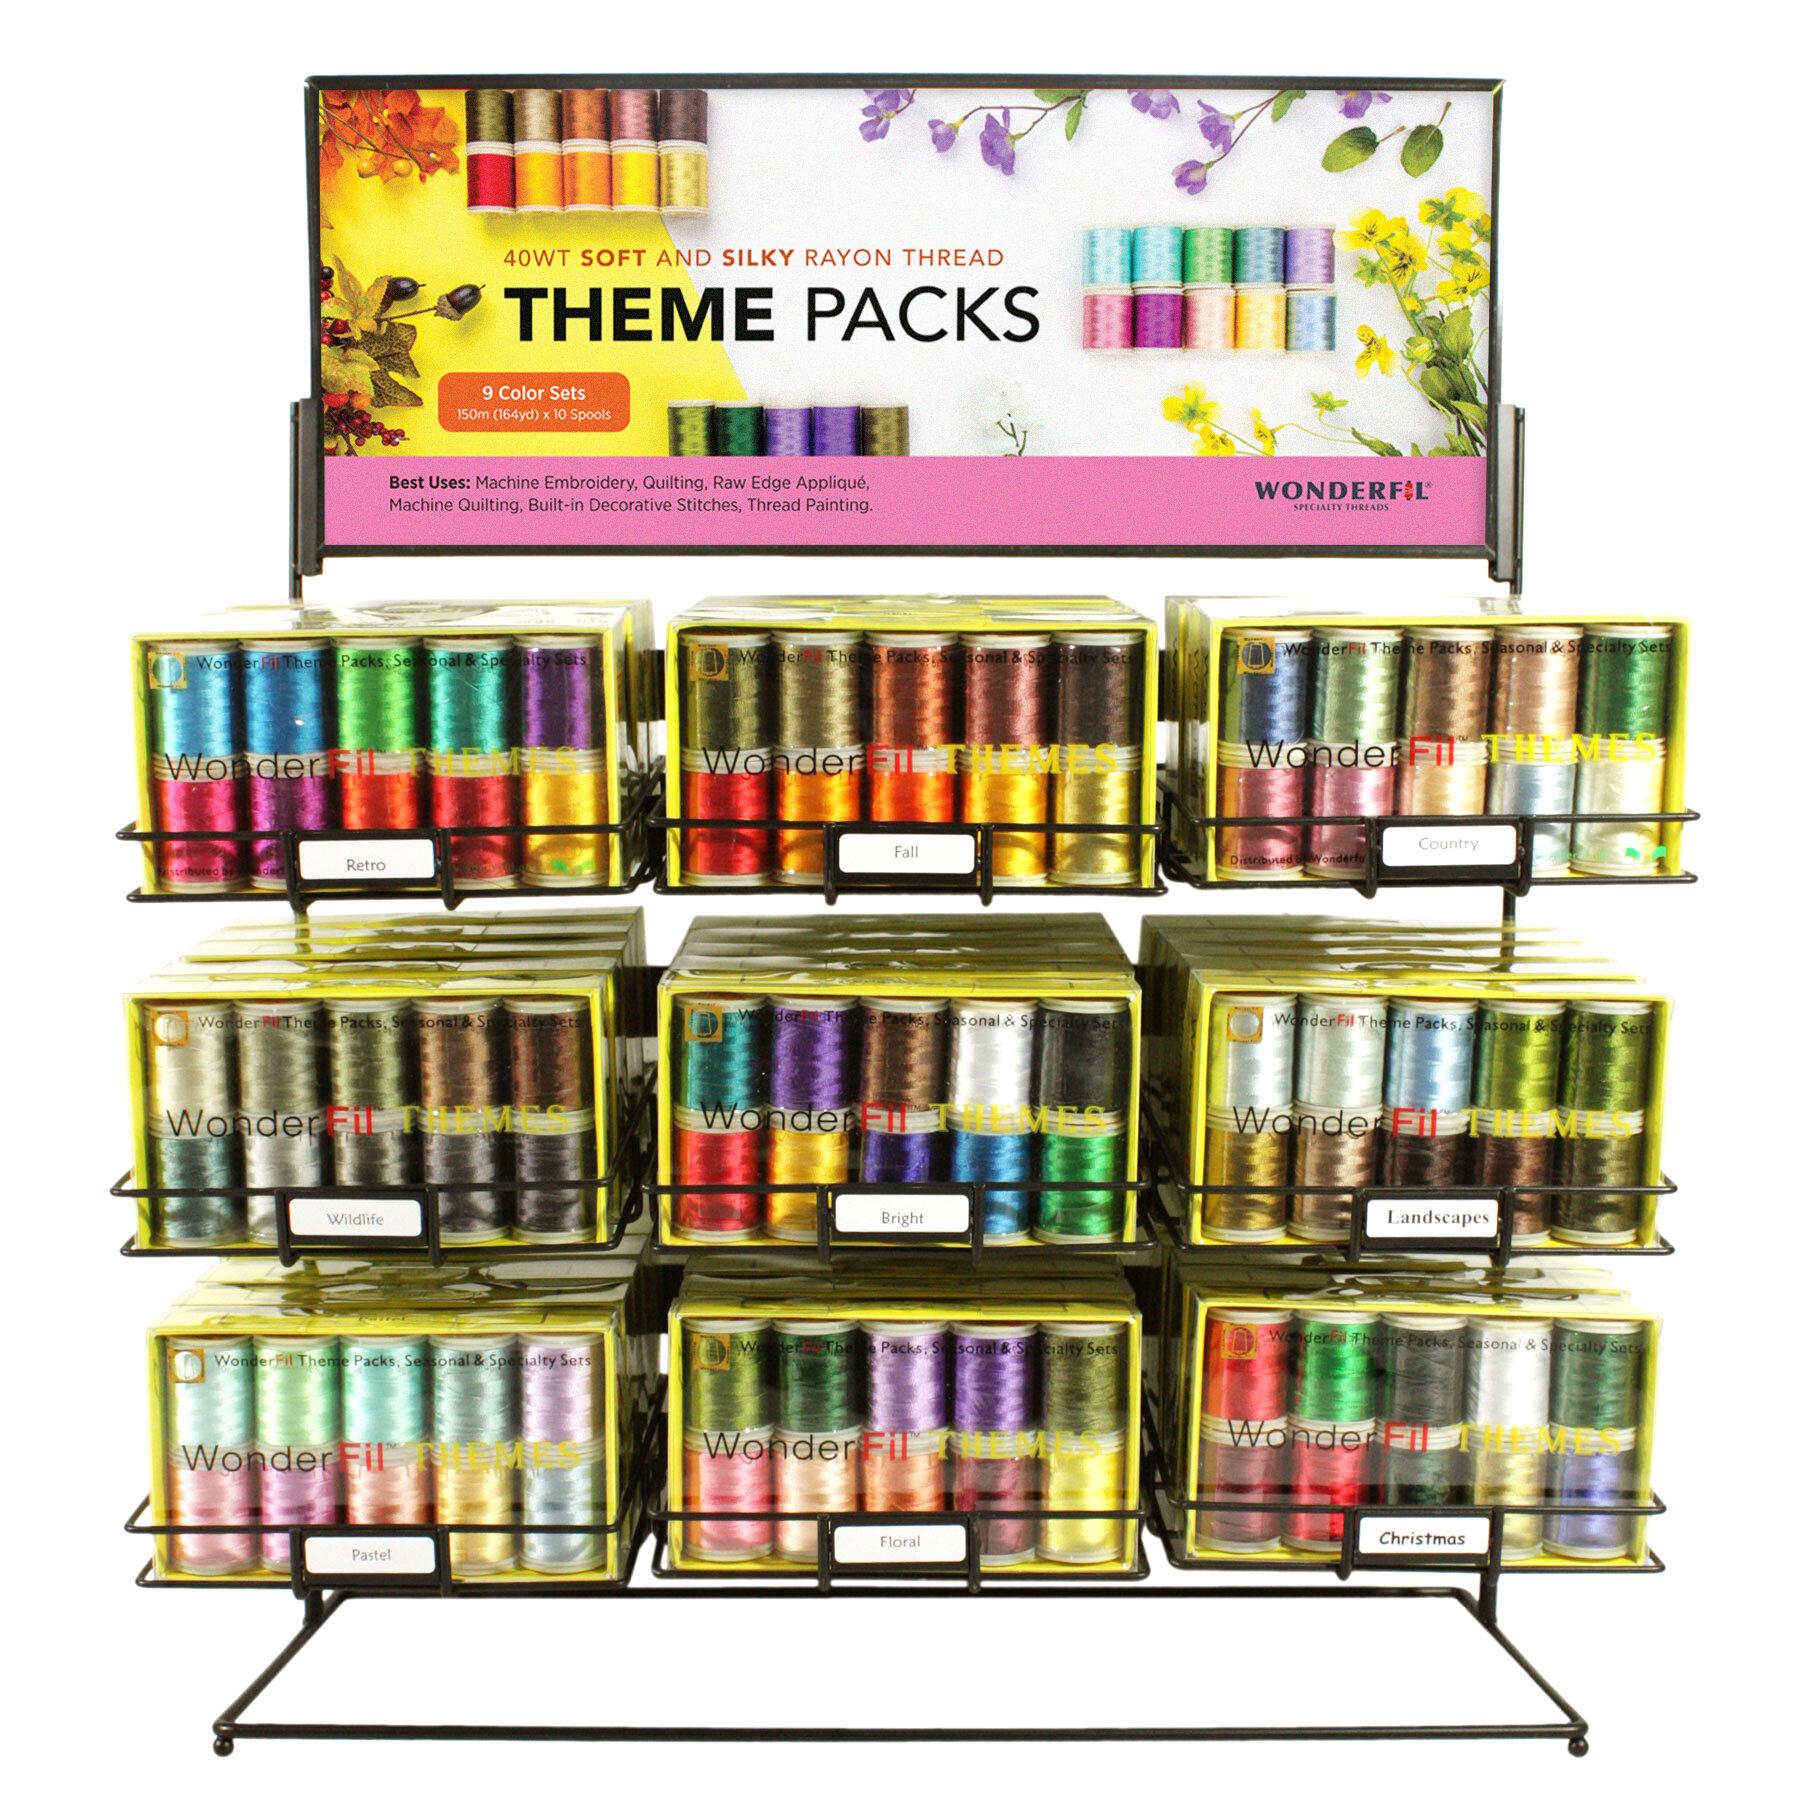 Theme-Packs-Display.jpg